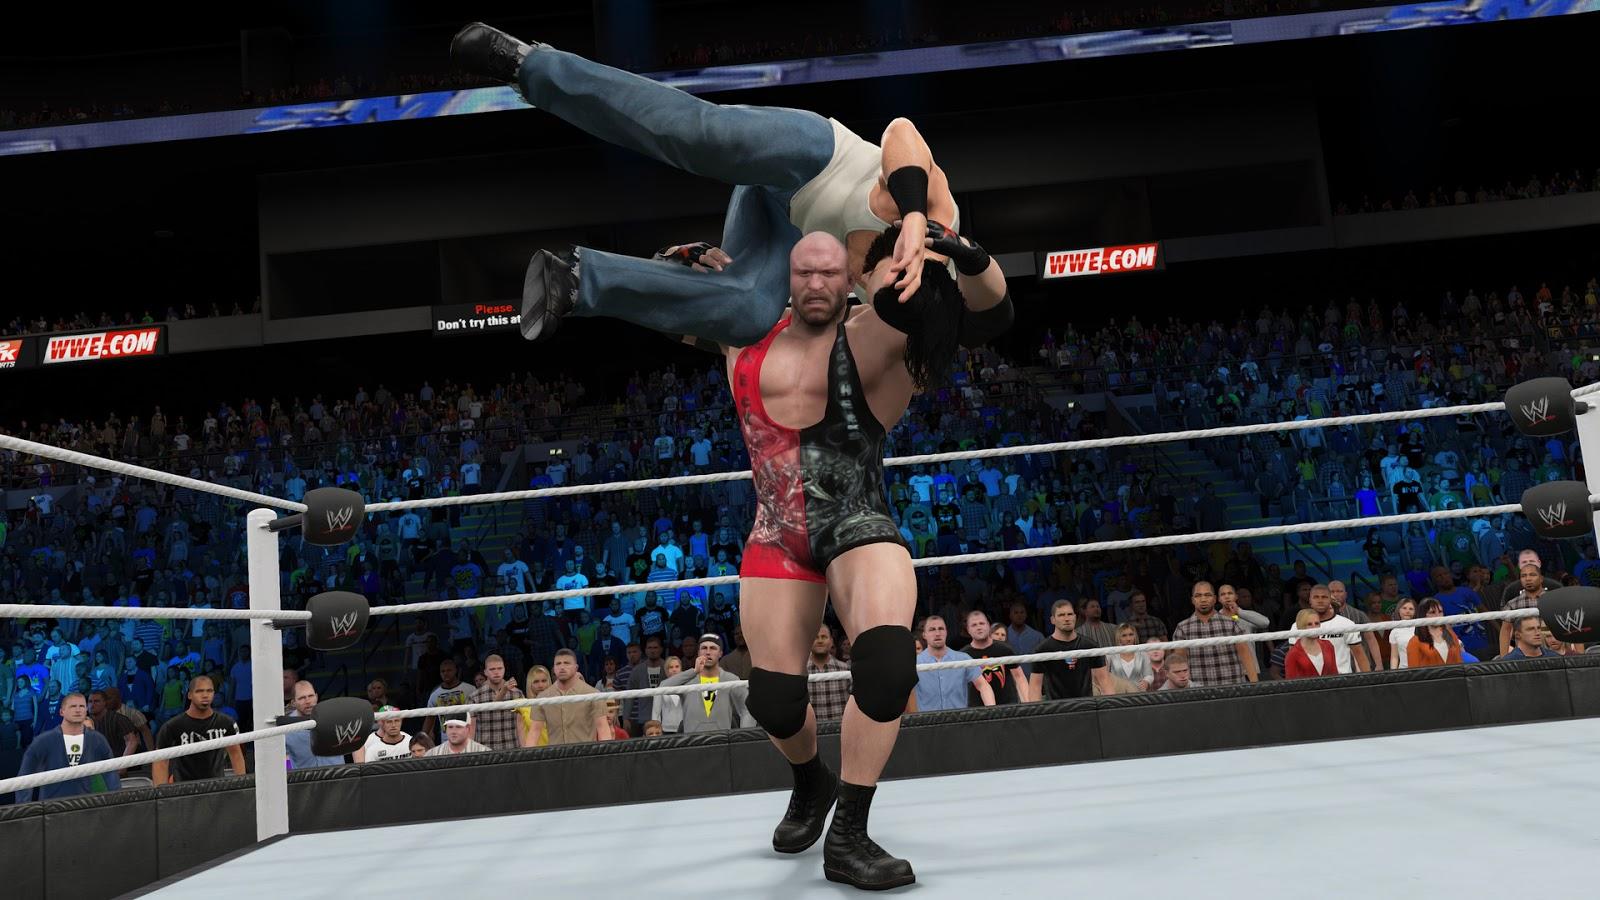 WWE 2k 15 free downloa...